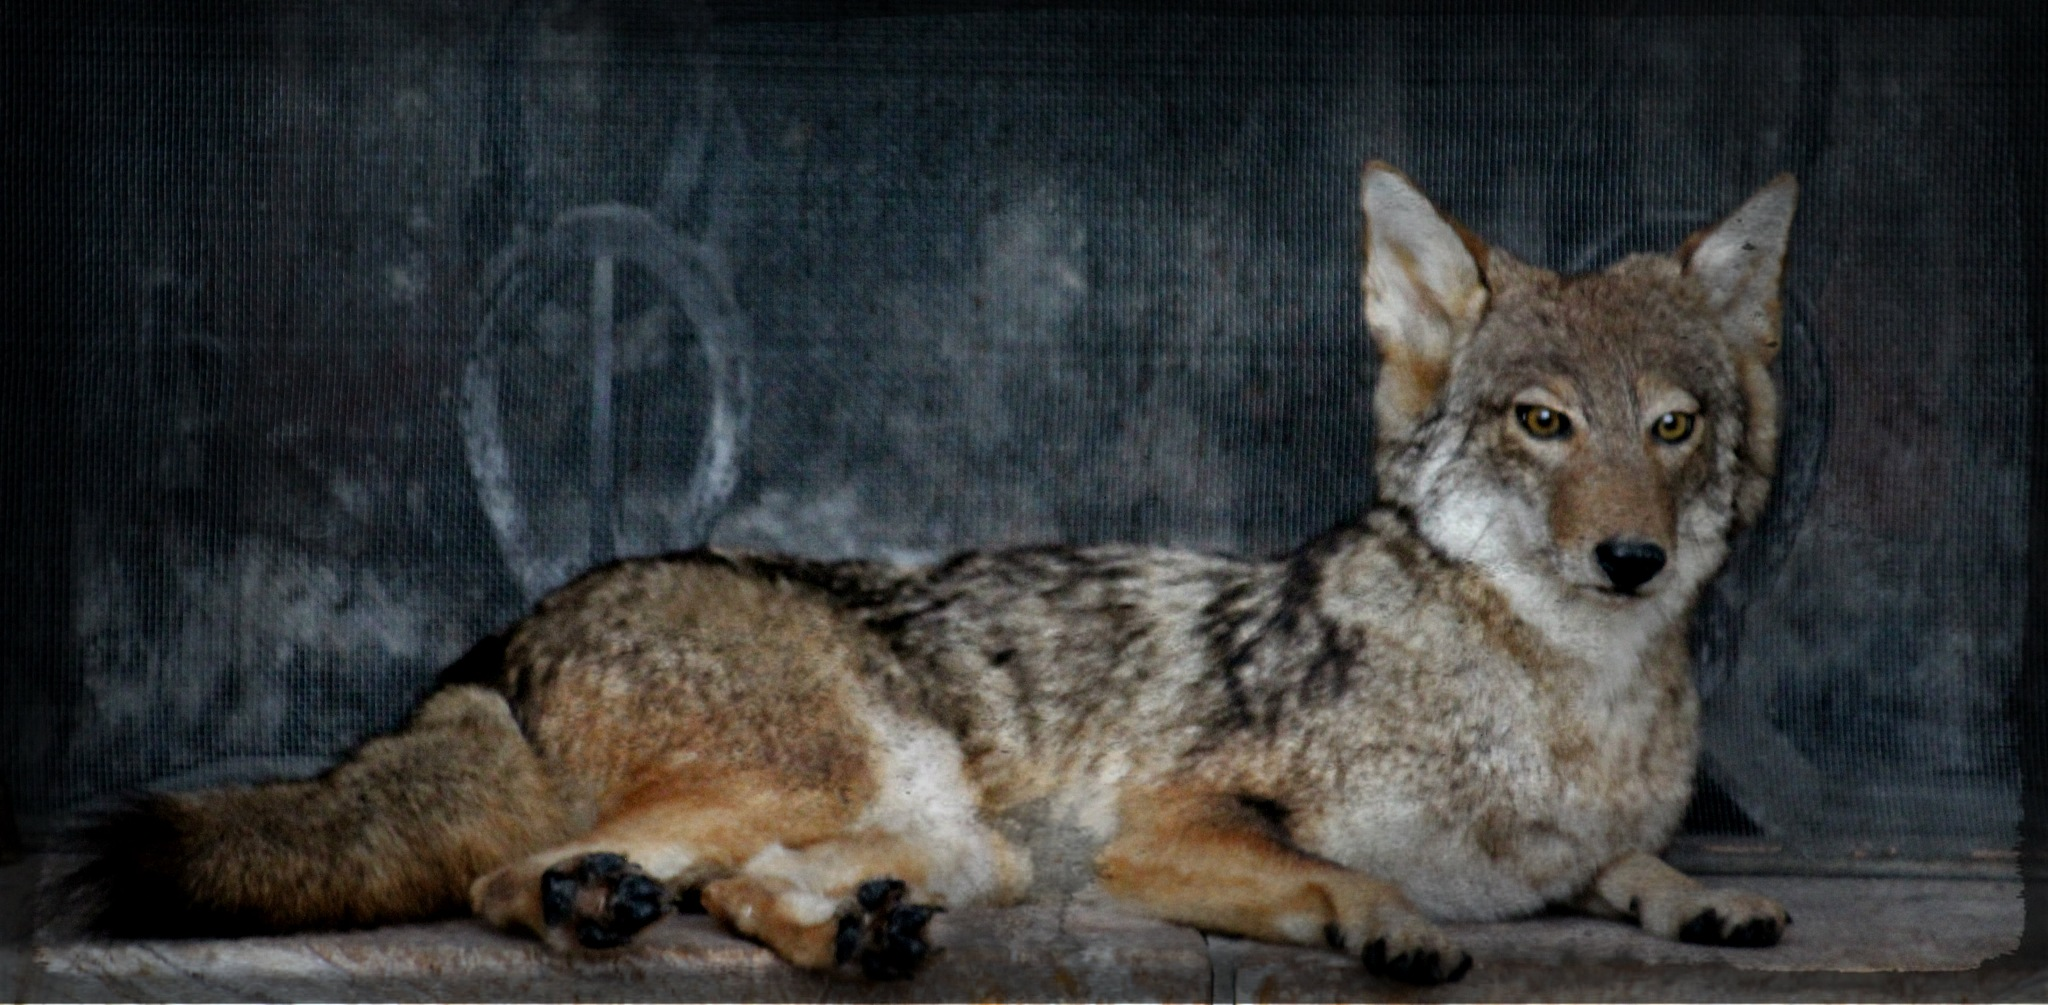 Wile E Coyote by Lucretia Bittner